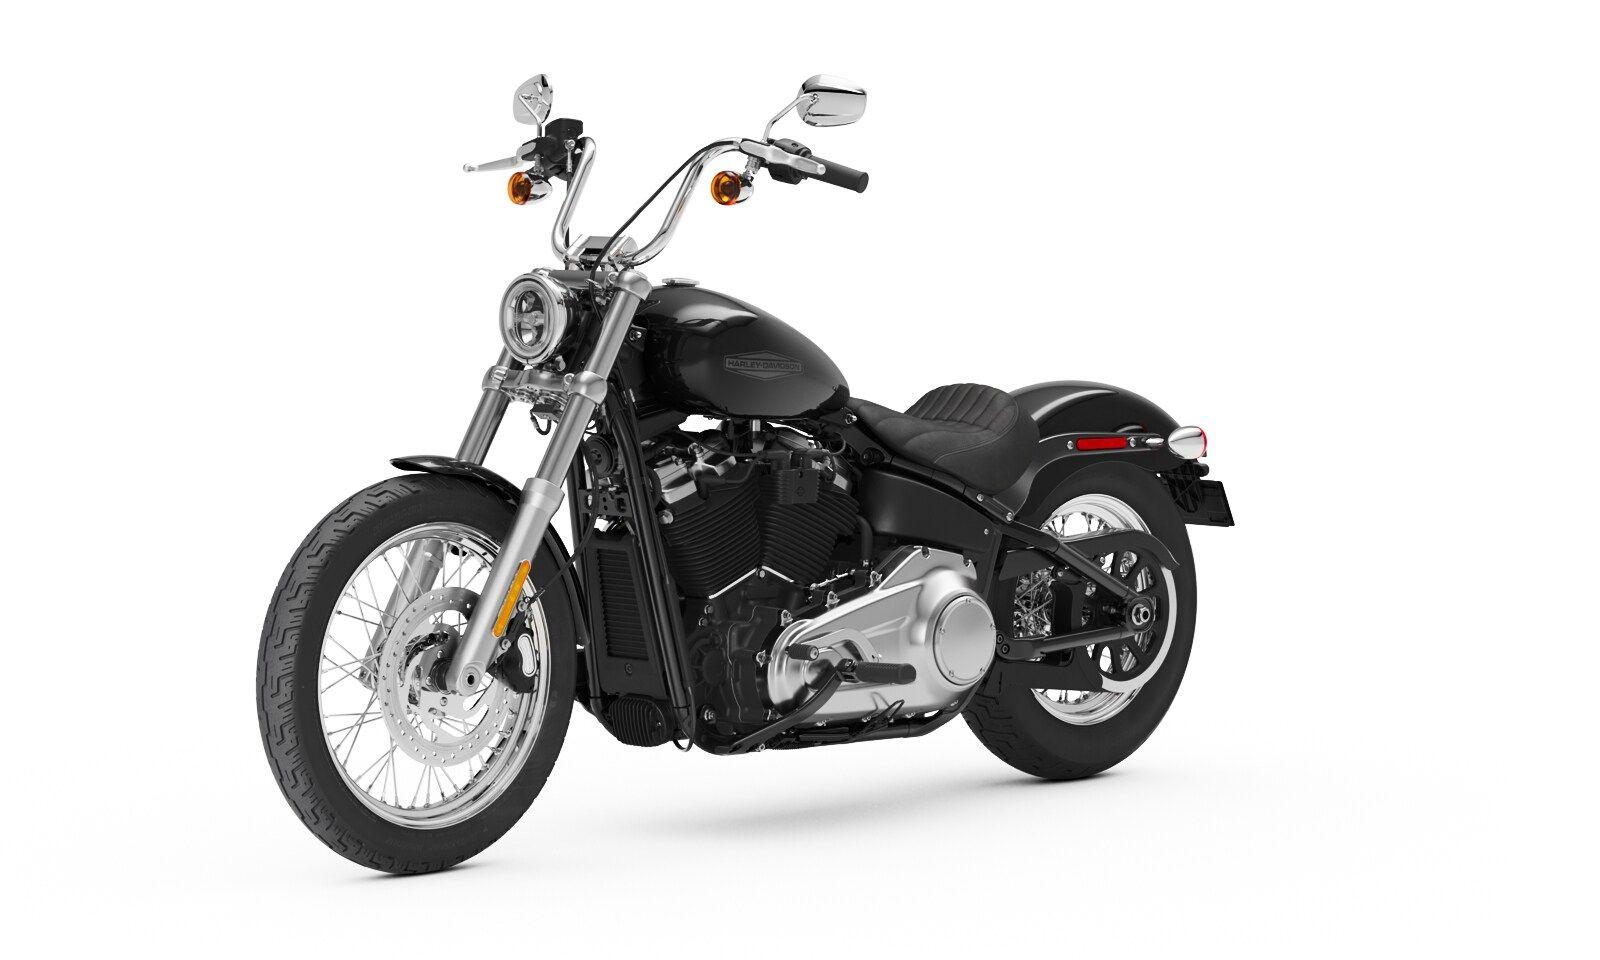 2020 Softail Standard Motorcycle Harley Davidson Usa In 2020 Harley Davidson Motorcycles Harley Davidson Images Motorcycle Harley